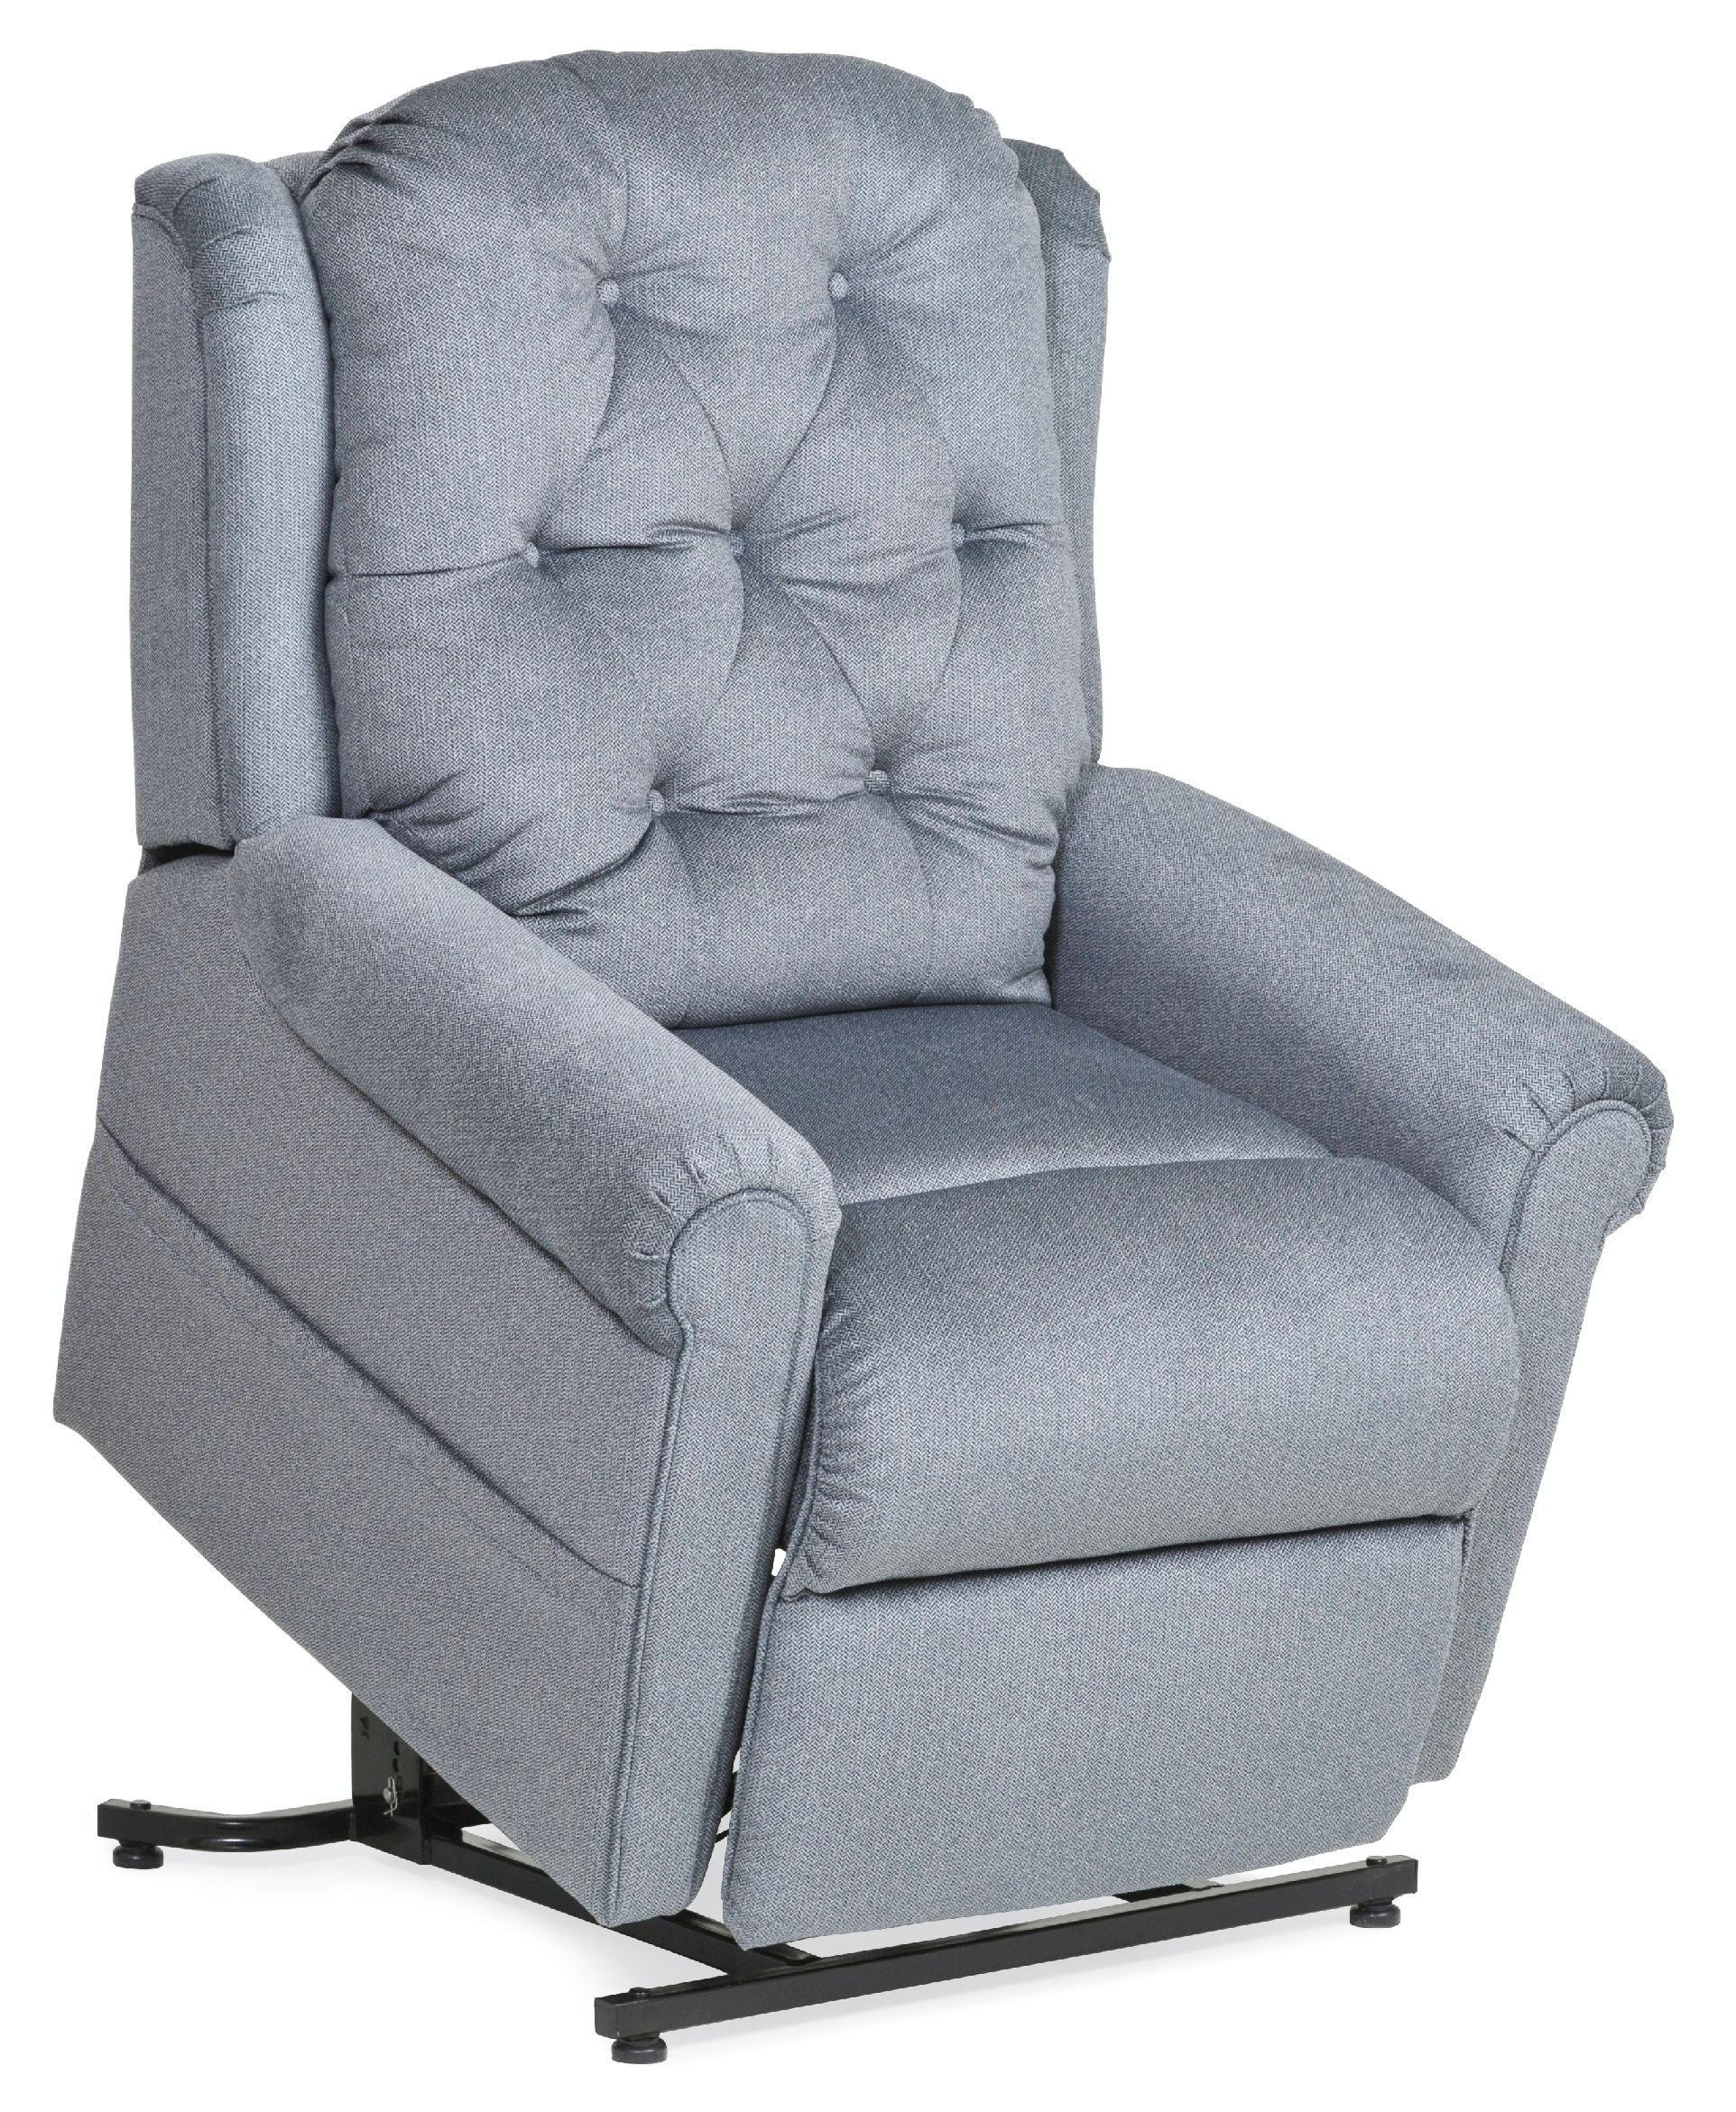 Living Room Dora Lift Chair Recliner